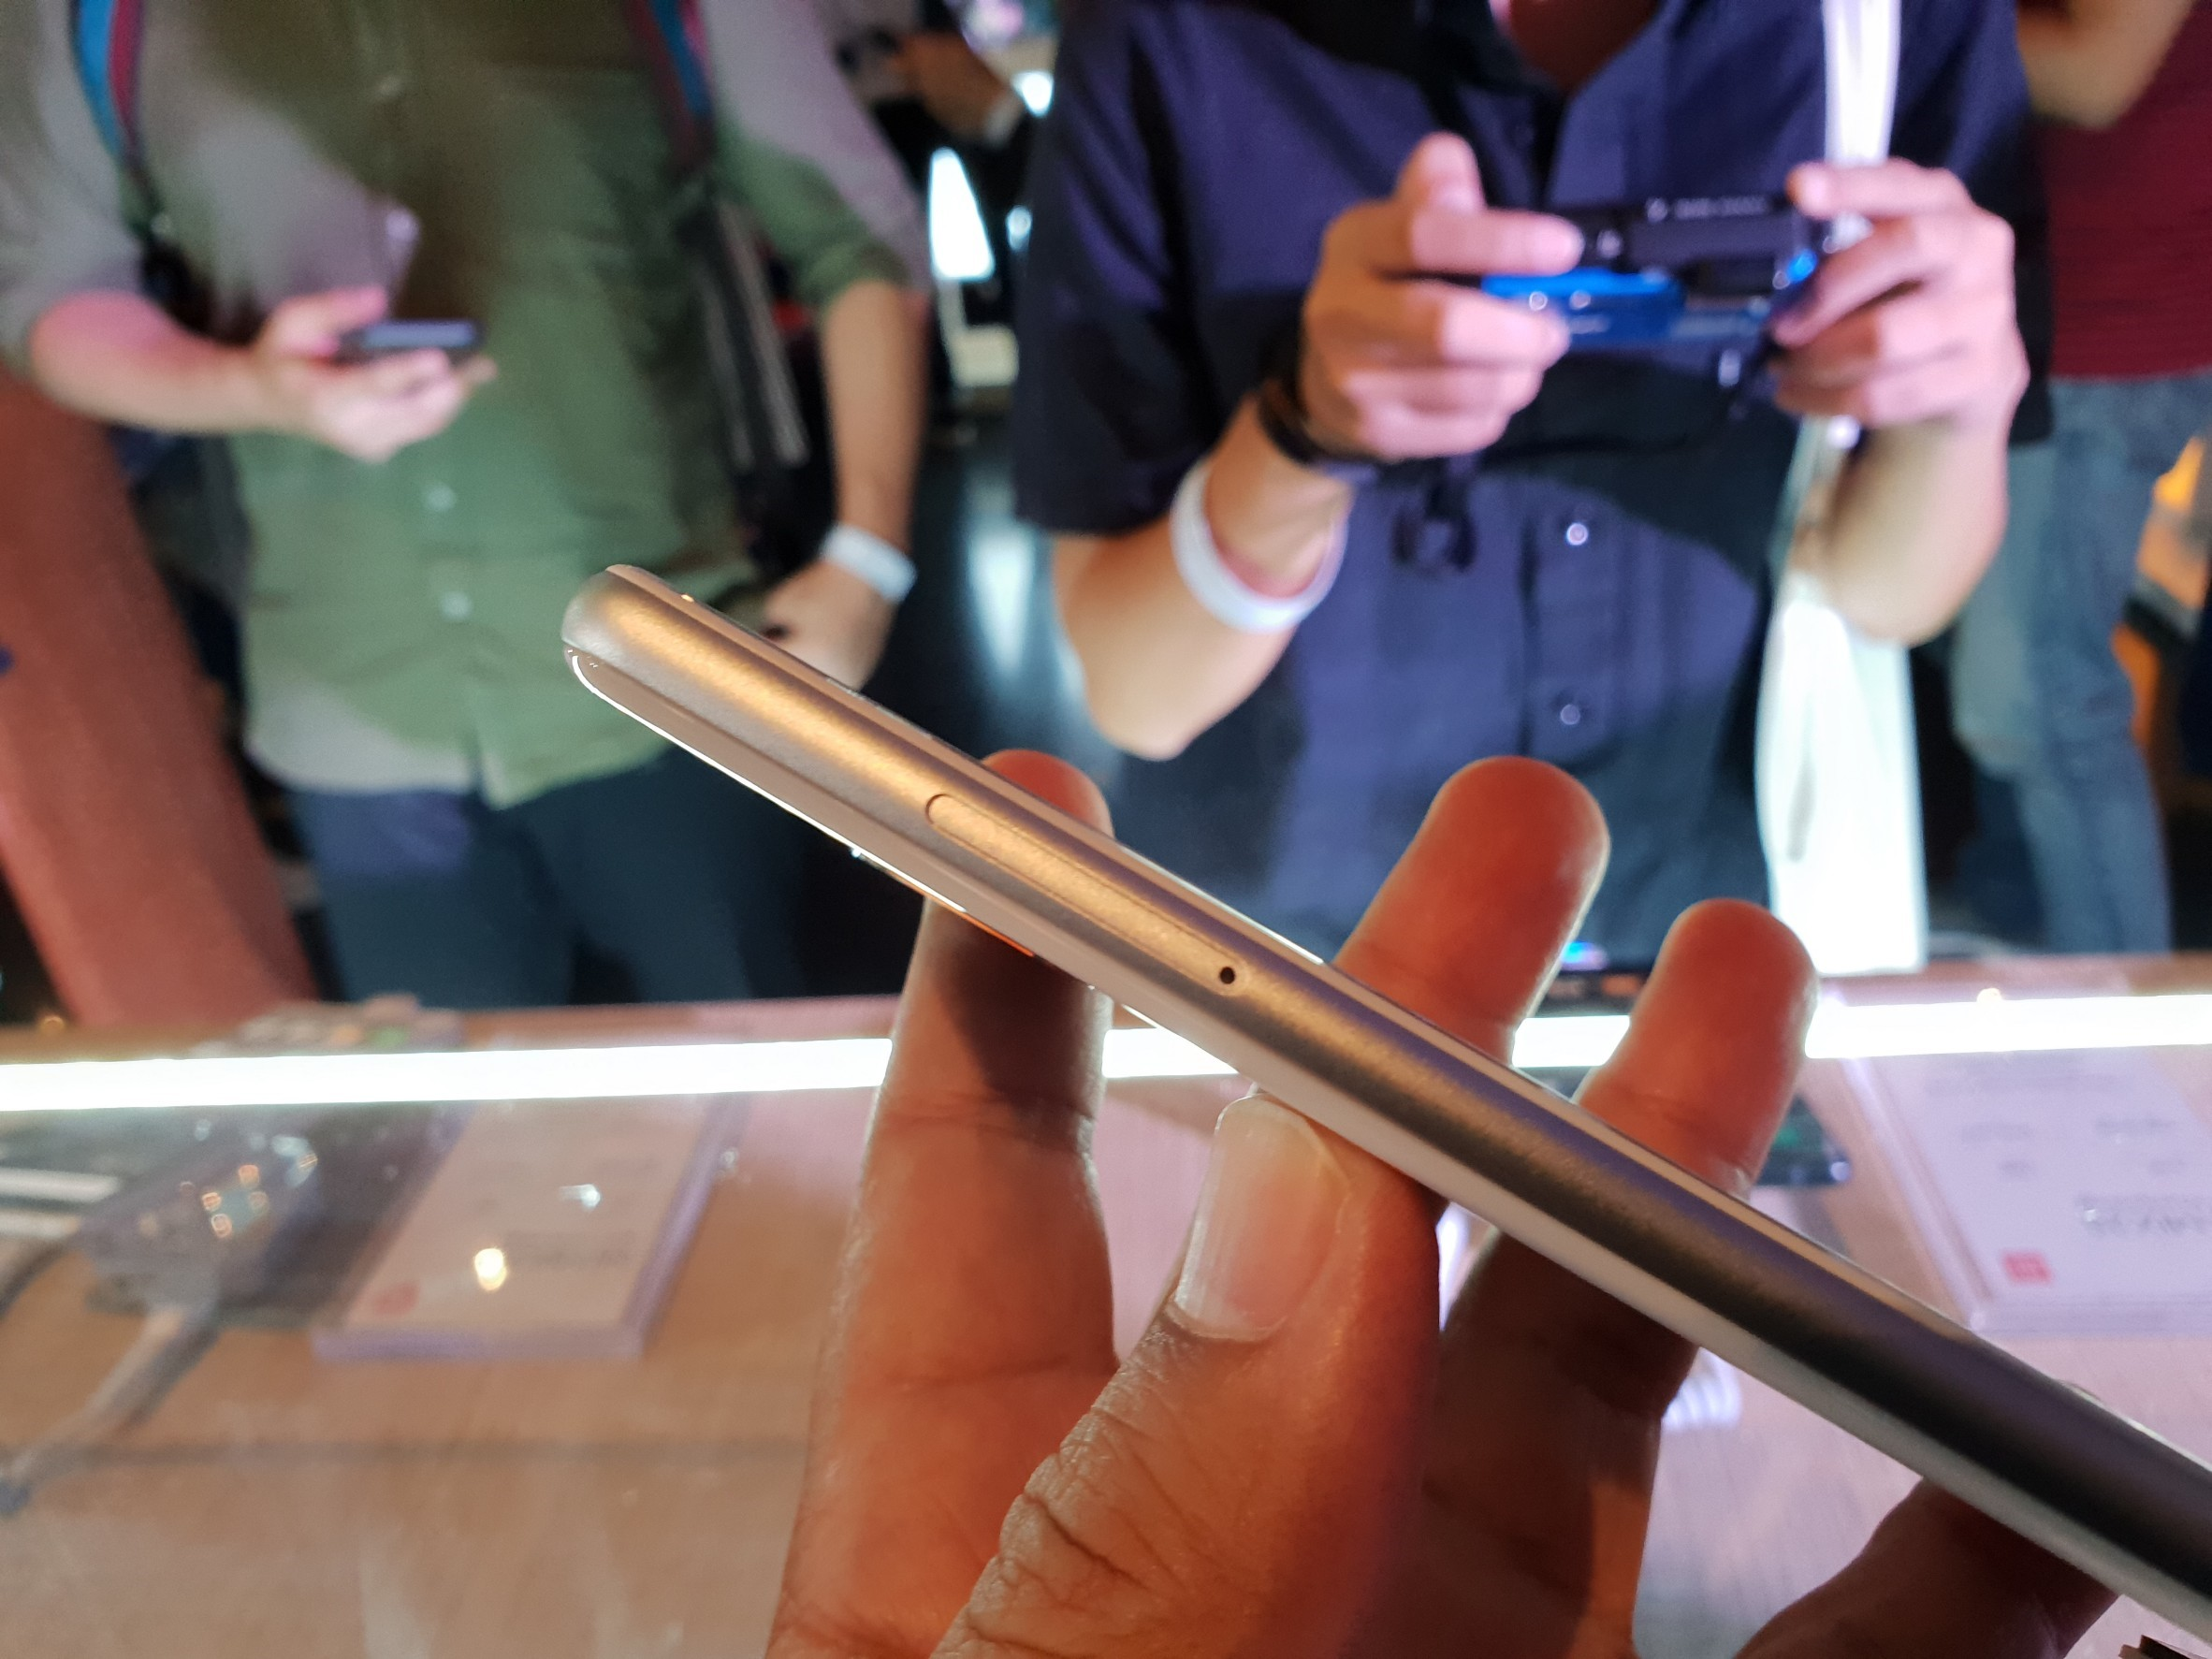 Xiaomi Mi Mix 2S Hands on 1 (3)